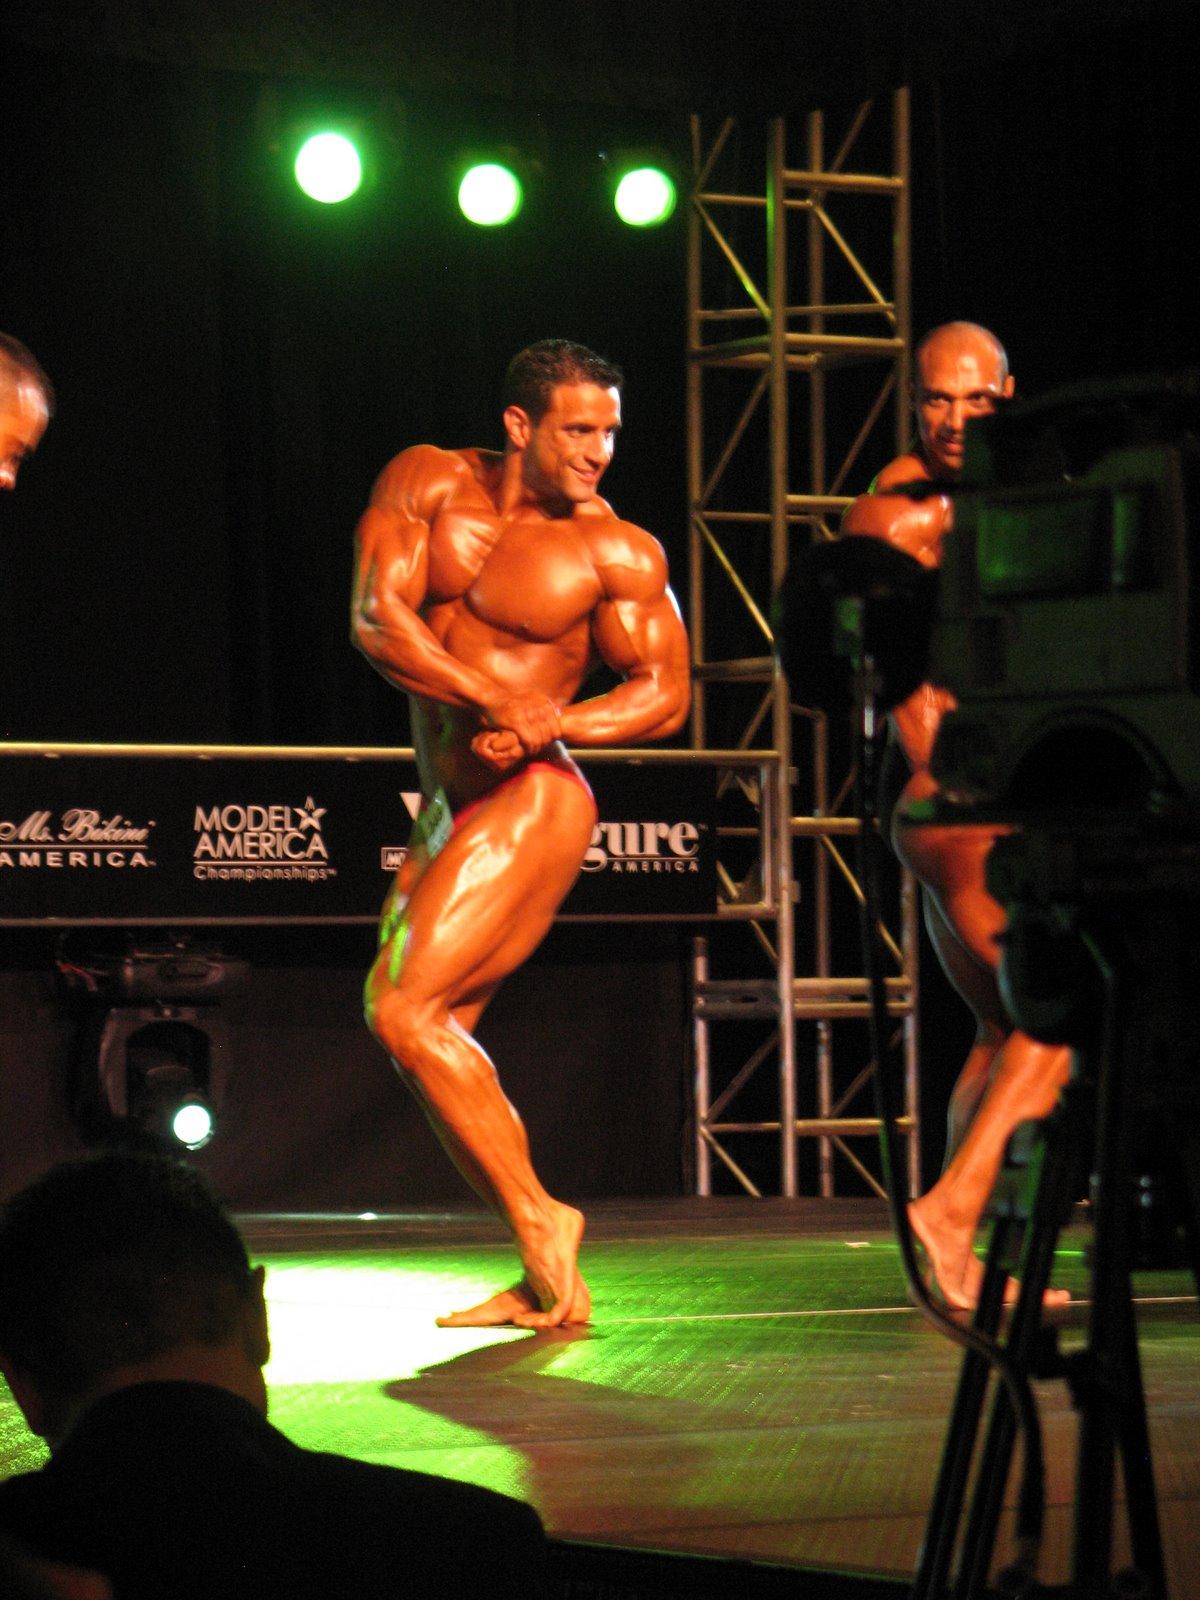 2008 Musclemania World